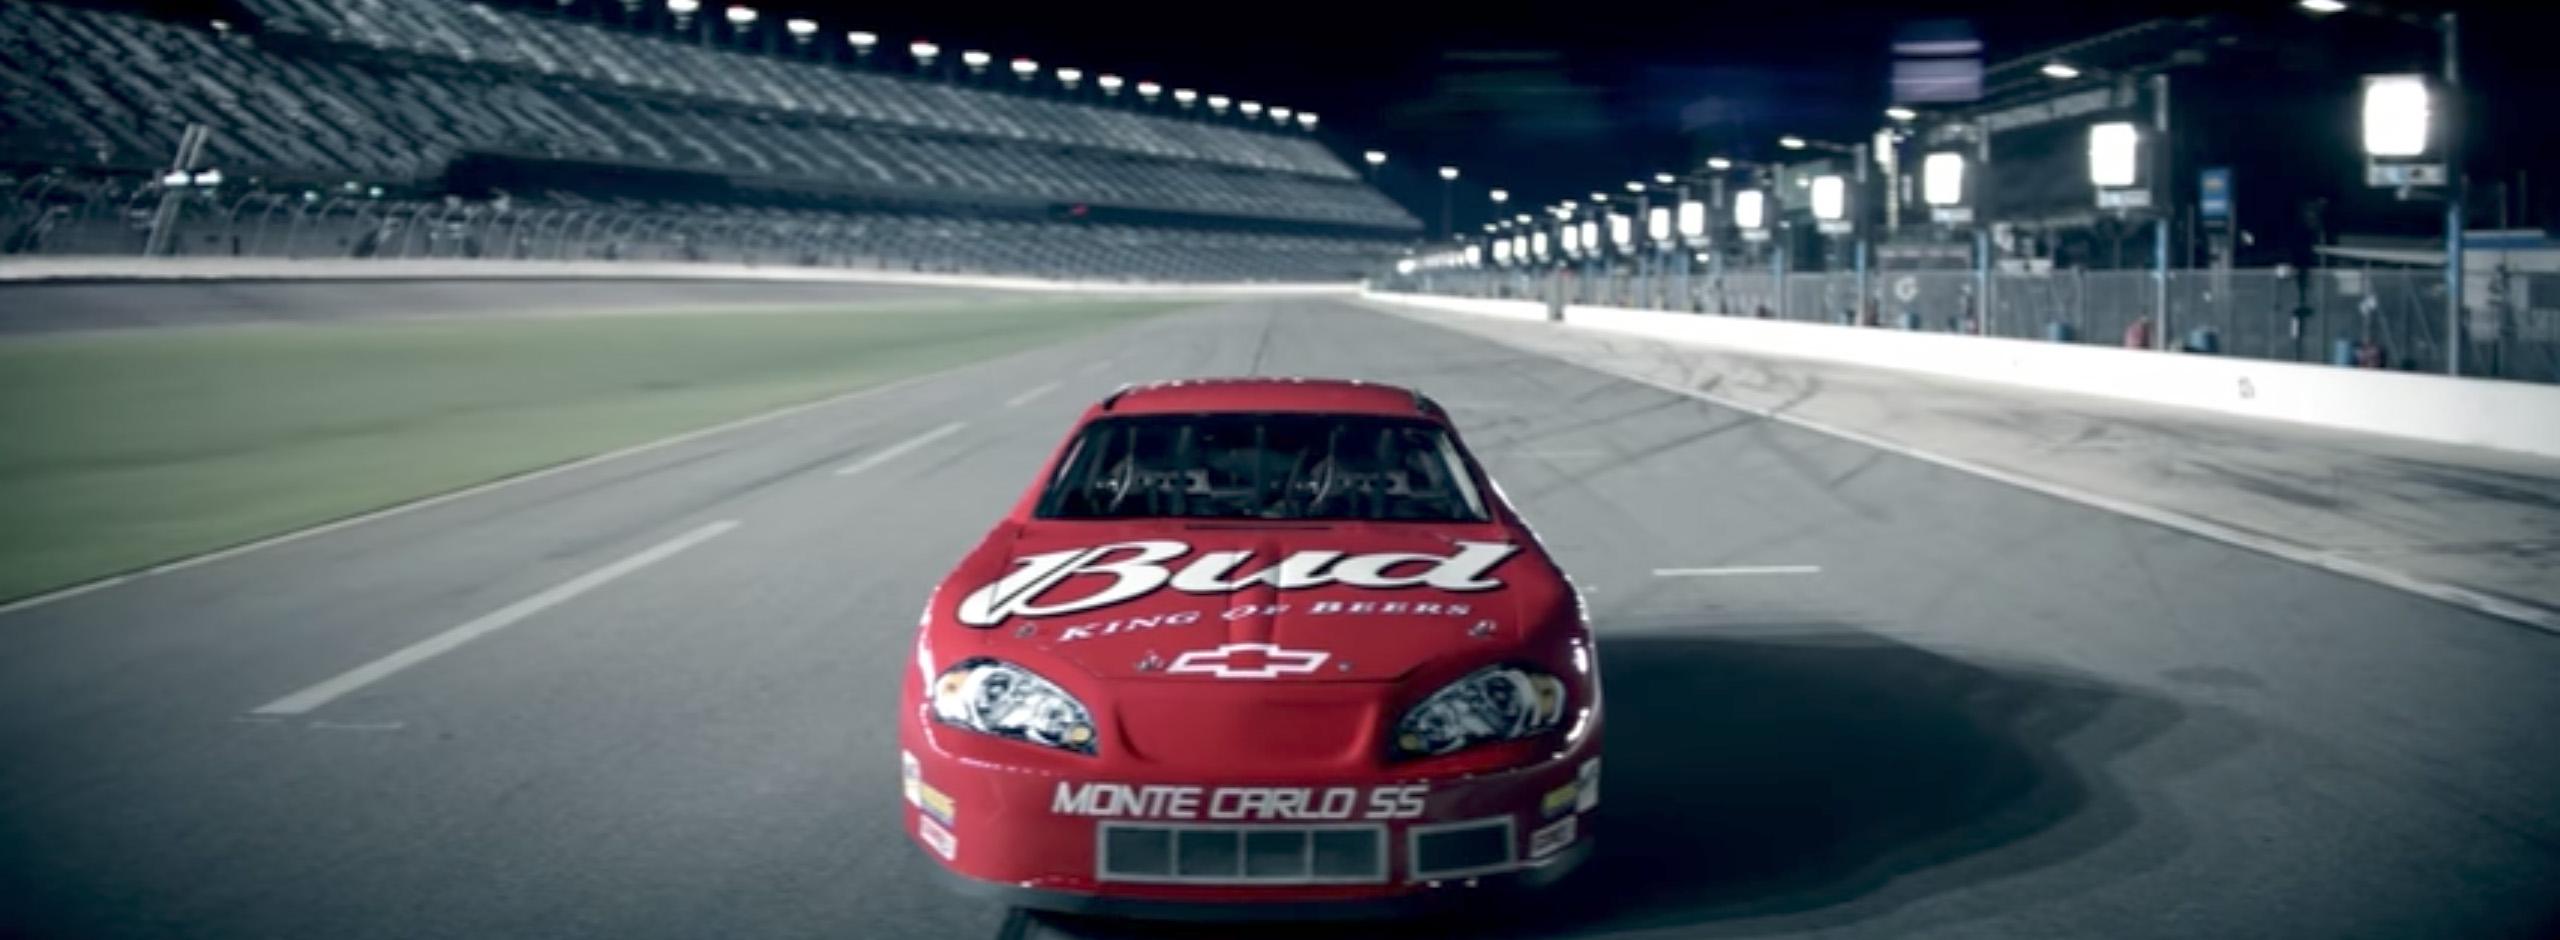 Budweiser Dale Earnhardt Jr - One Last Ride Commercial